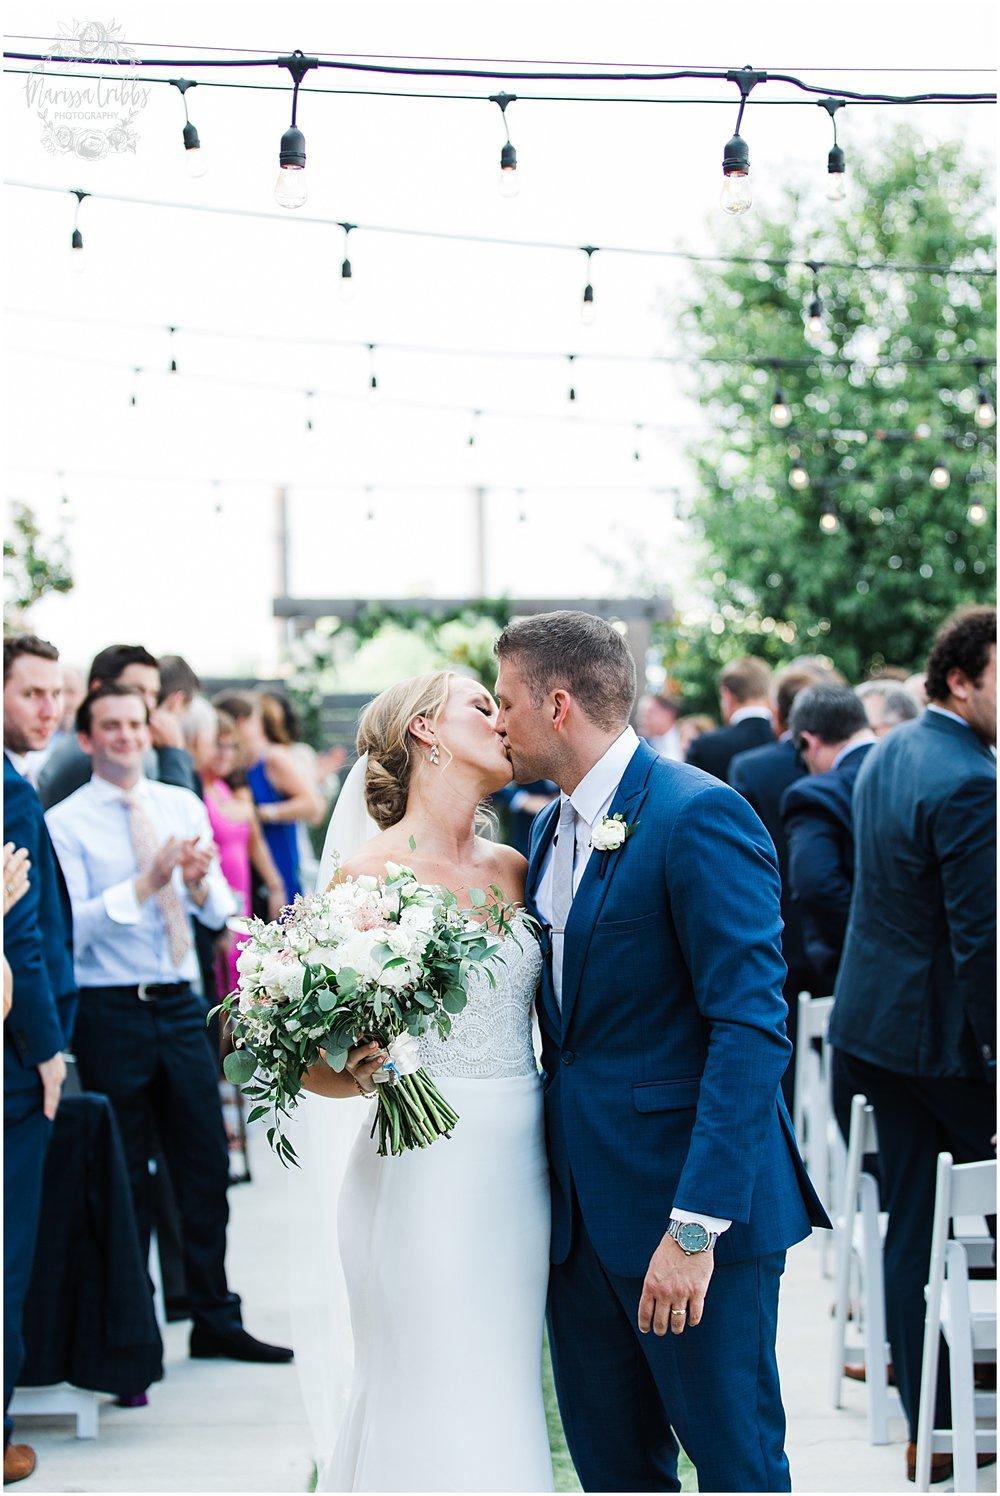 MAGNOLIA VENUE WEDDING | CHARLIE & NATALIE | MARISSA CRIBBS PHOTOGRAPHY_5769.jpg